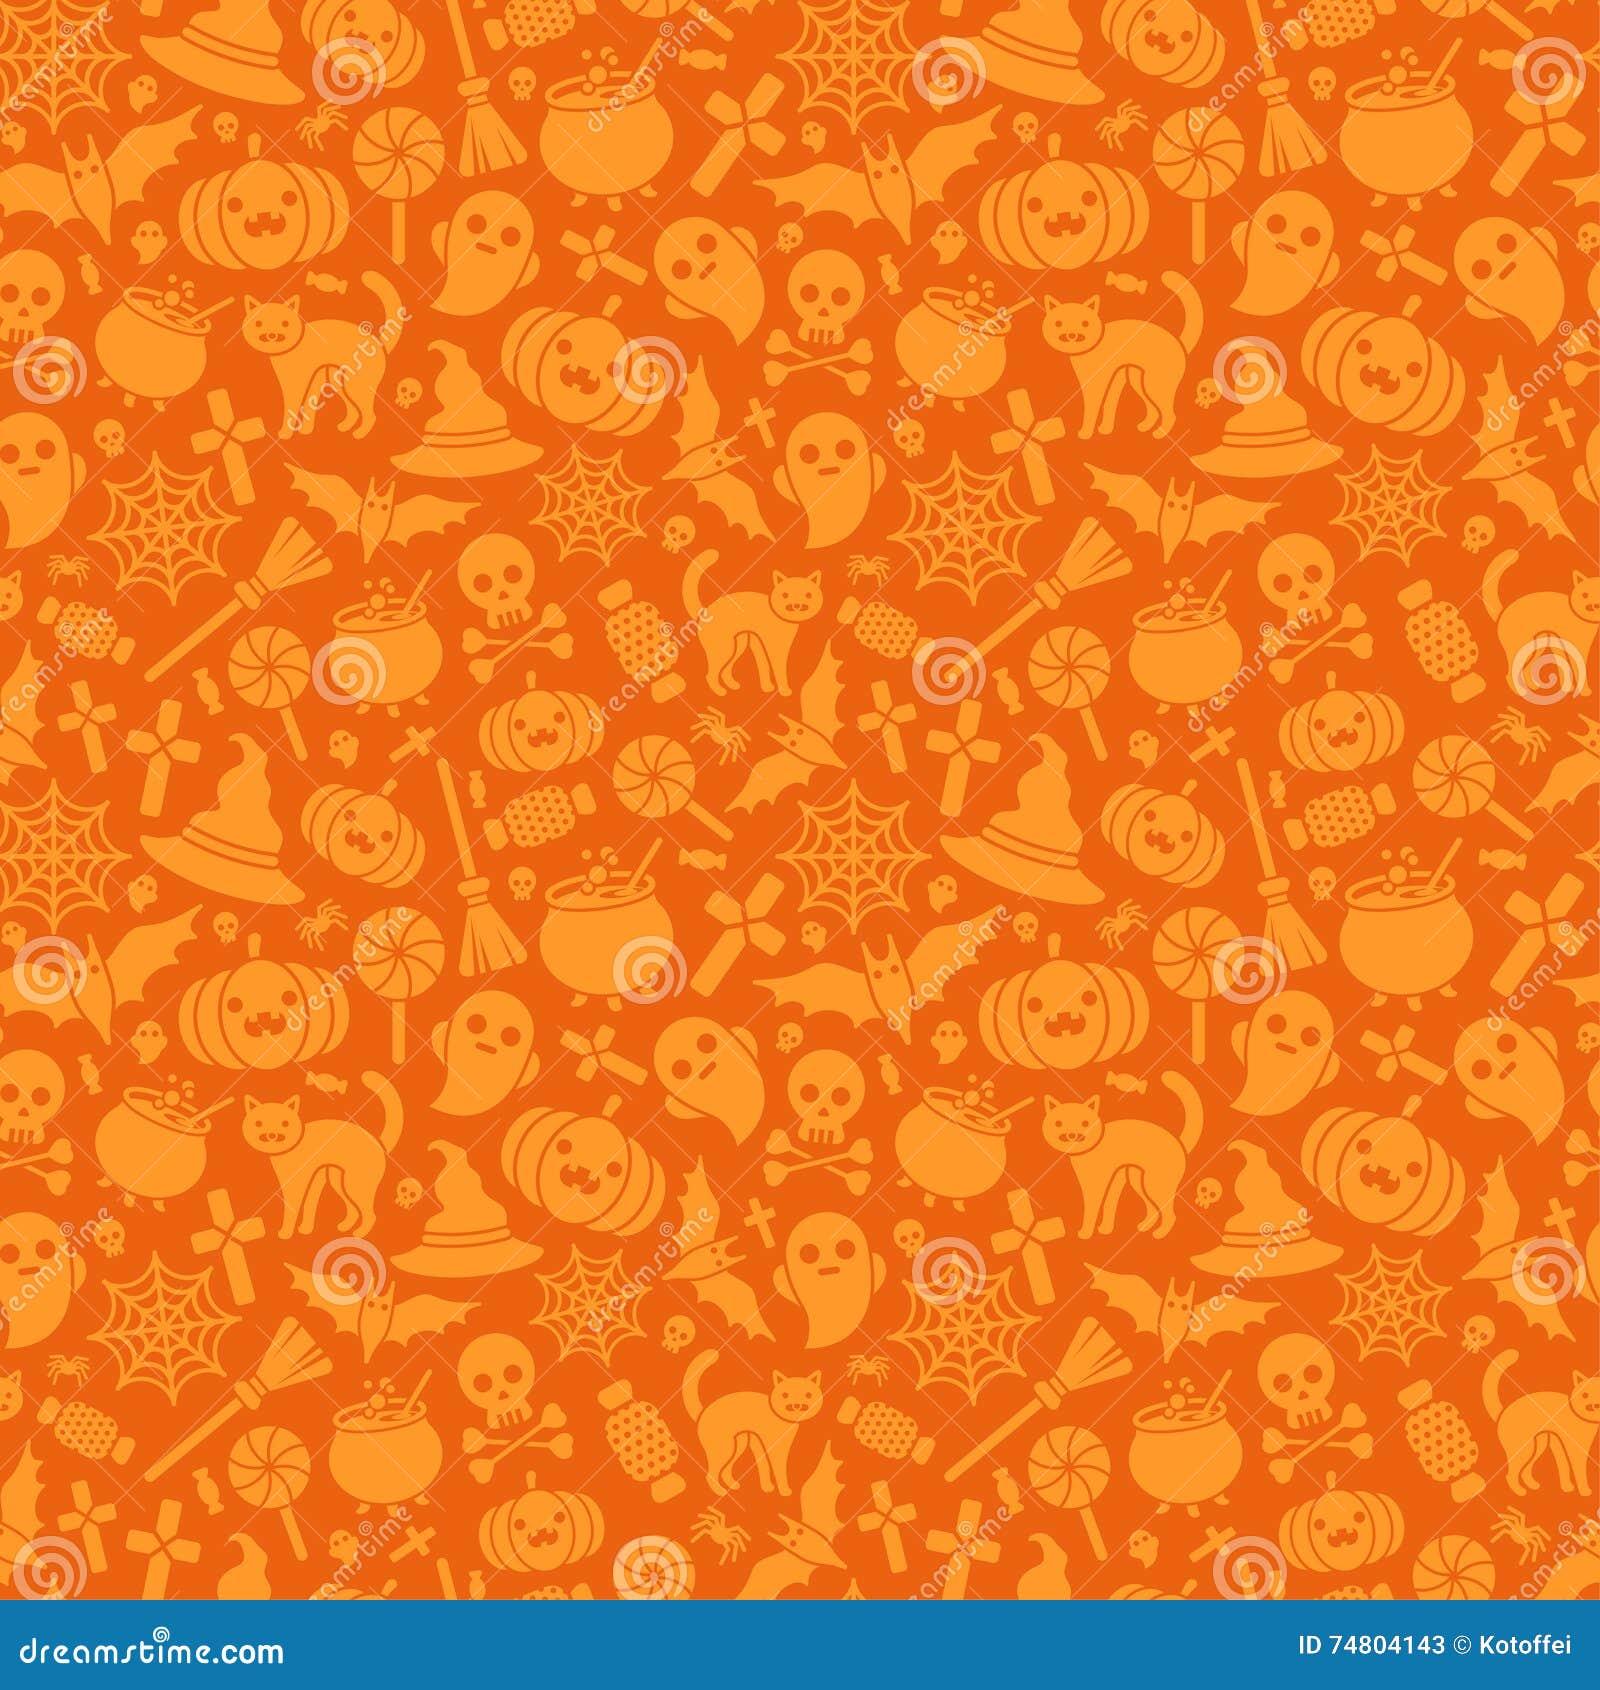 Black and orange halloween background